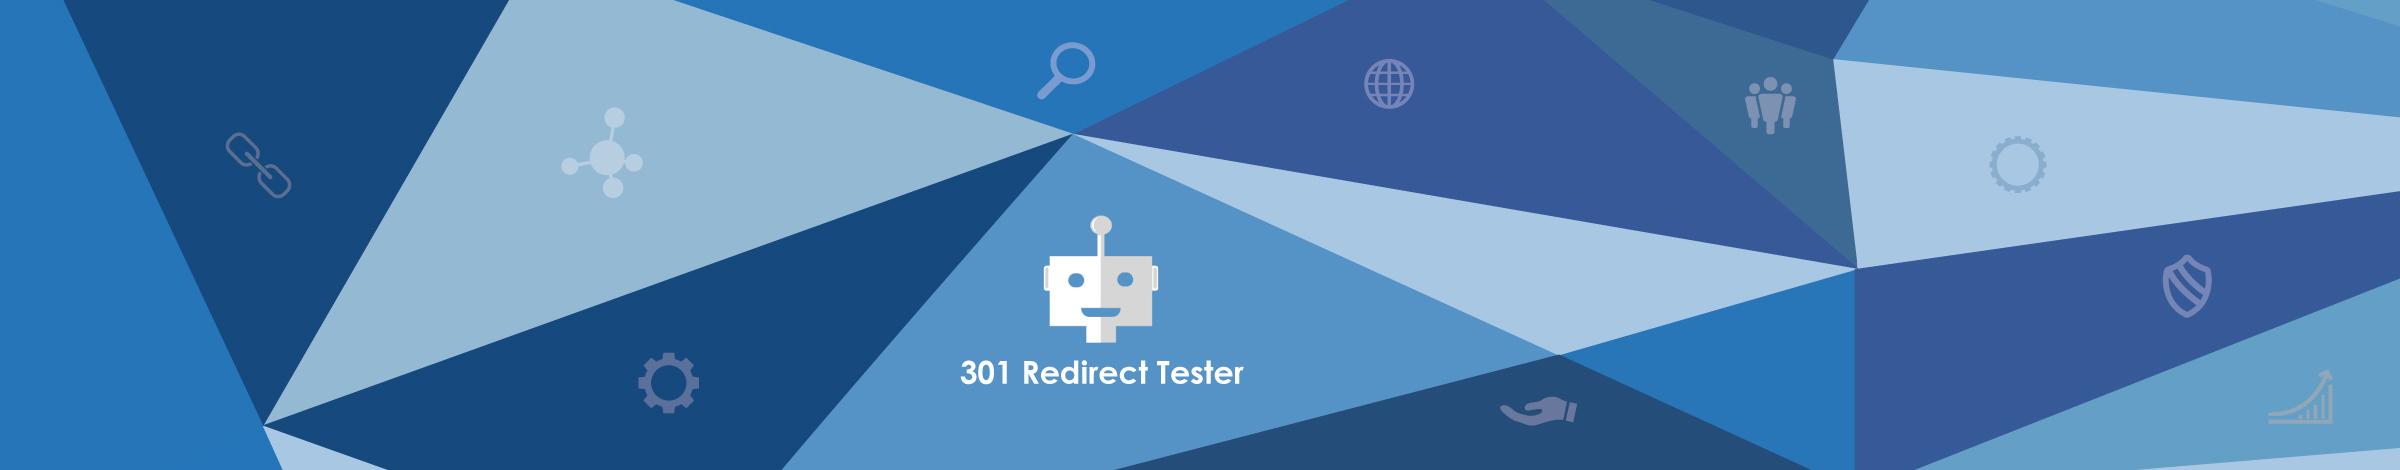 web_updates_kmu_wuk-ch_301-Redirect-Tester